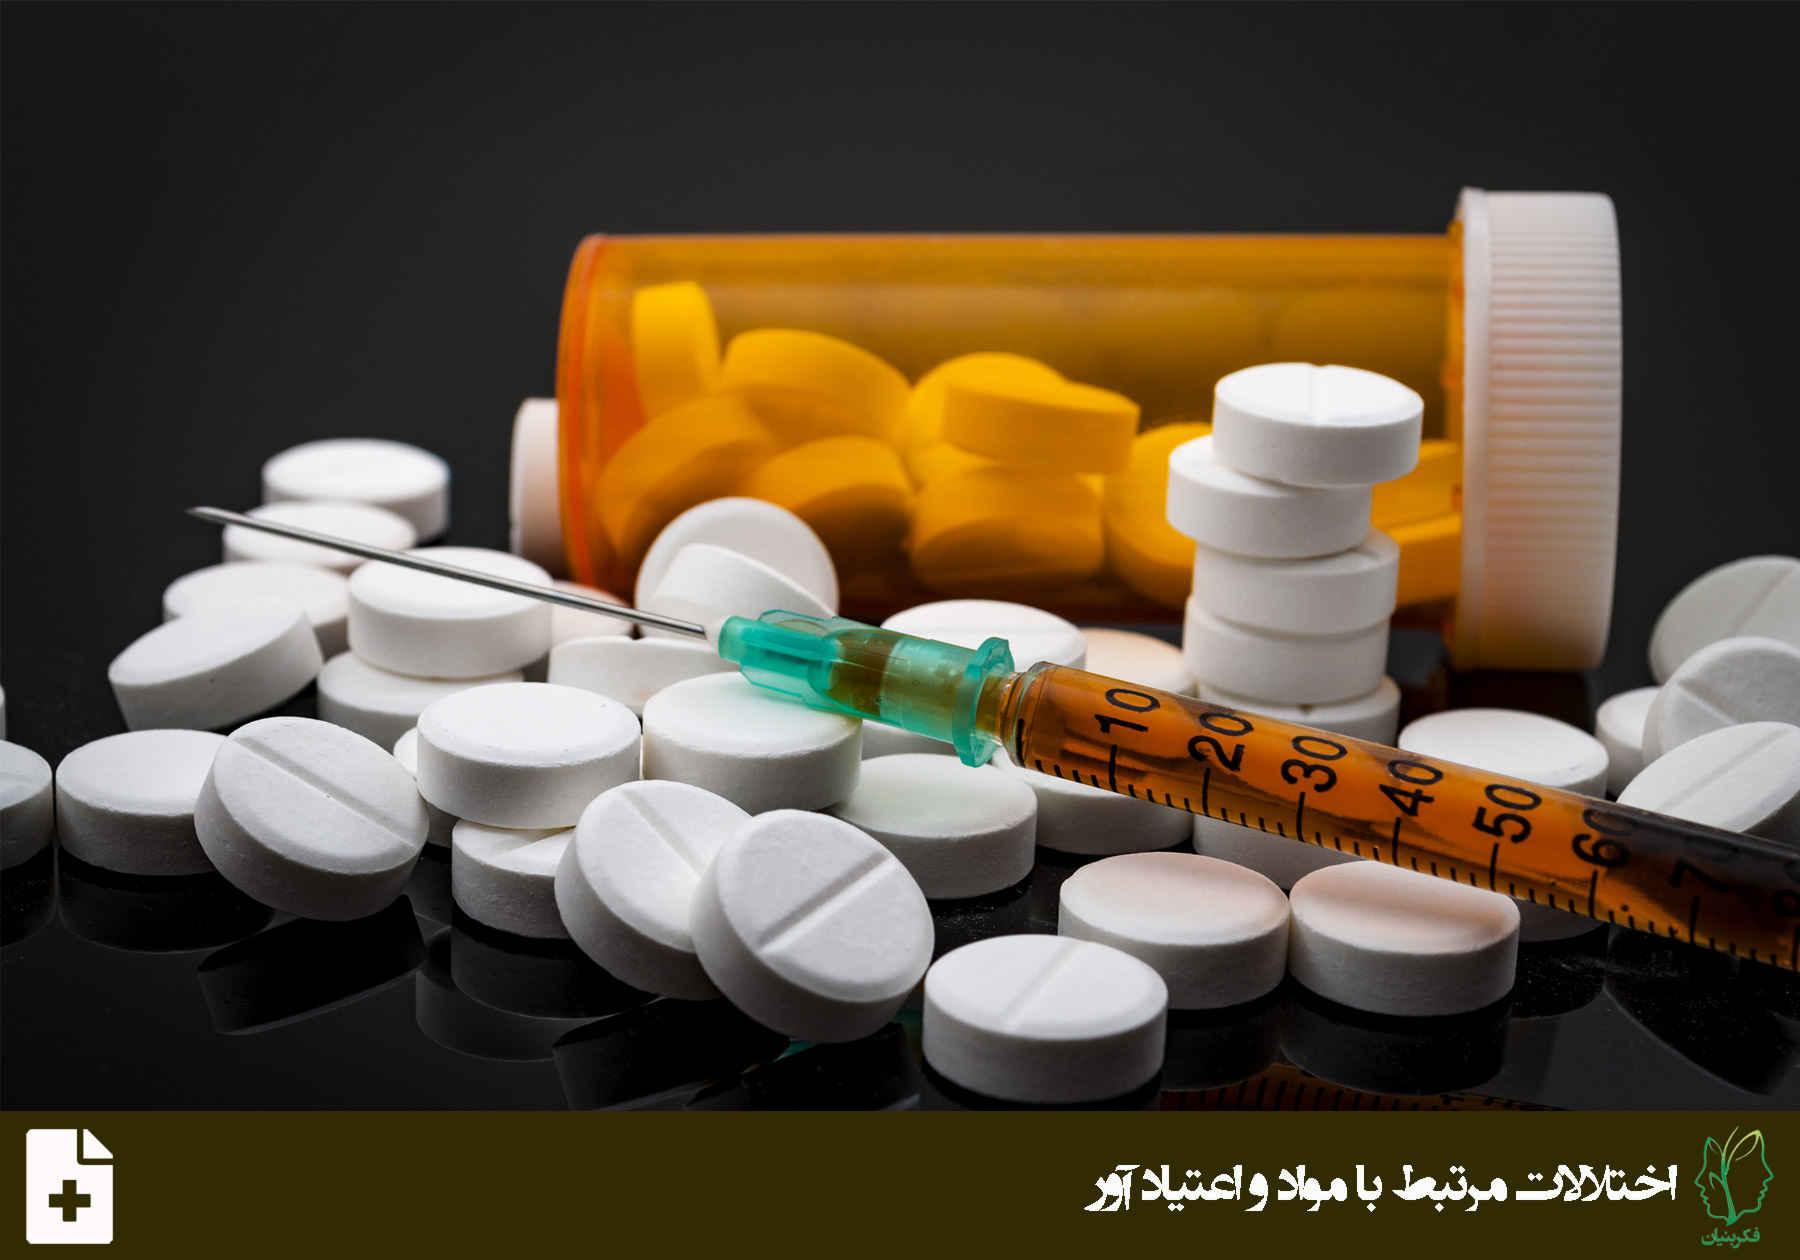 اختلالات مرتبط با مواد افیونی (Opioid-Related Disorders)